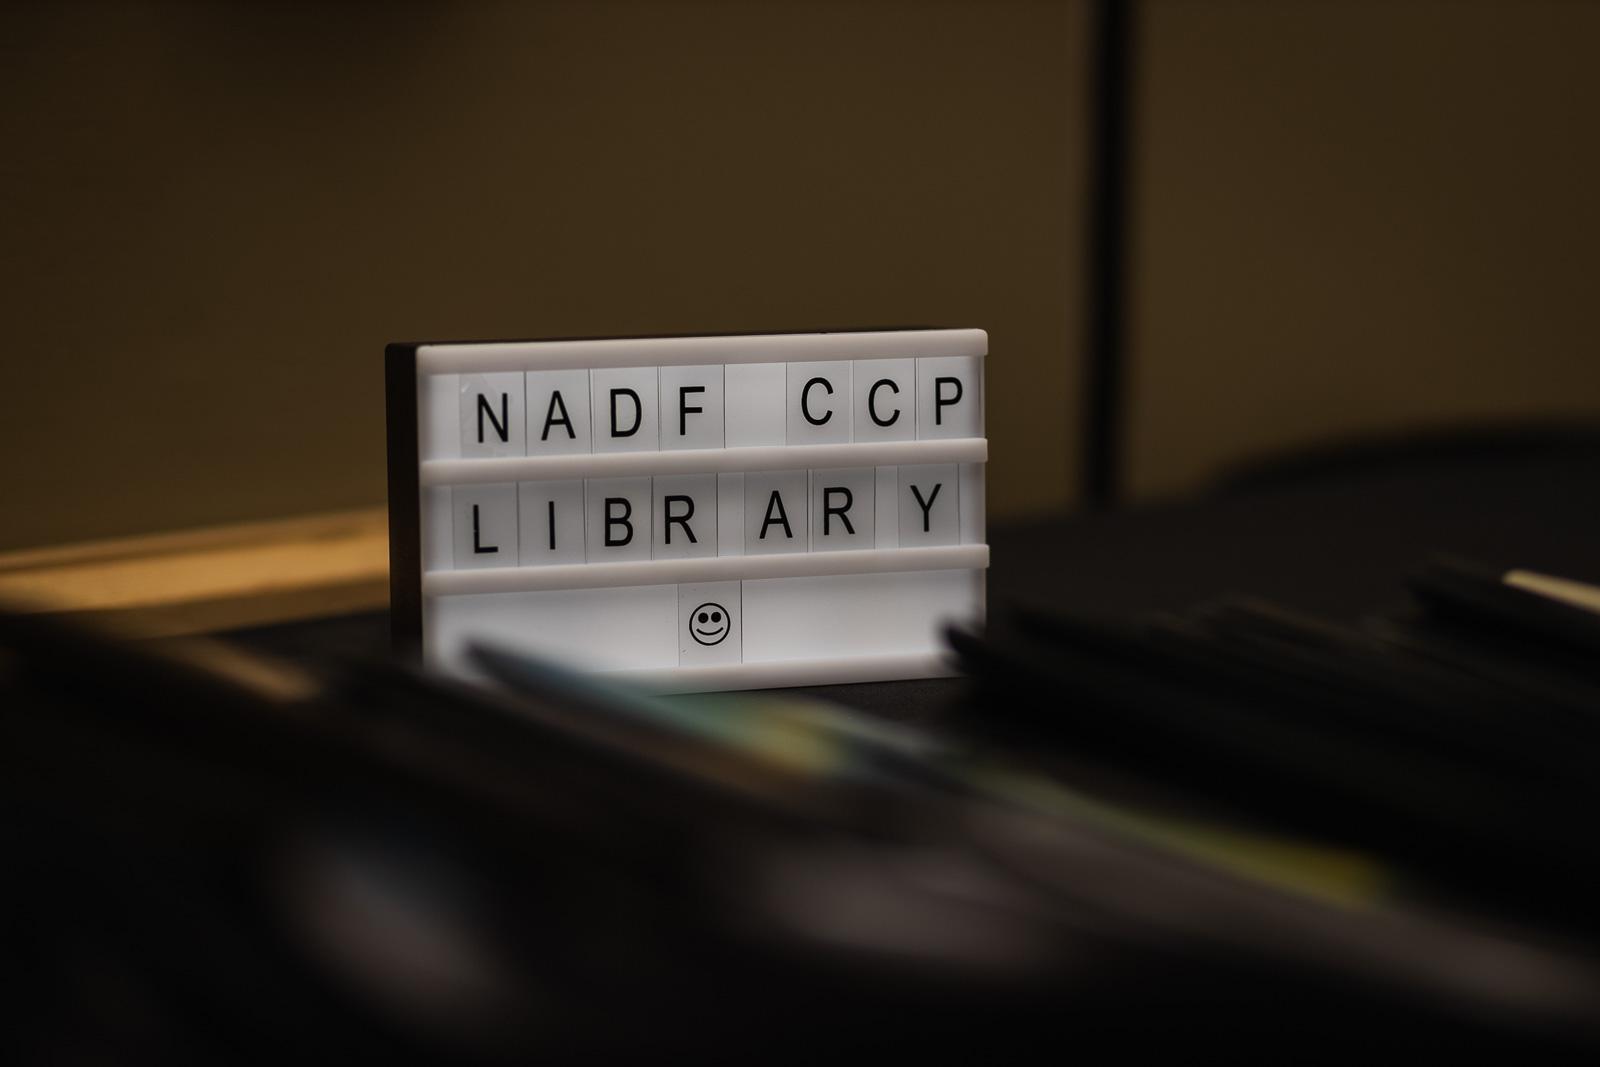 nadf-ccp-workshop-blog-7.jpg